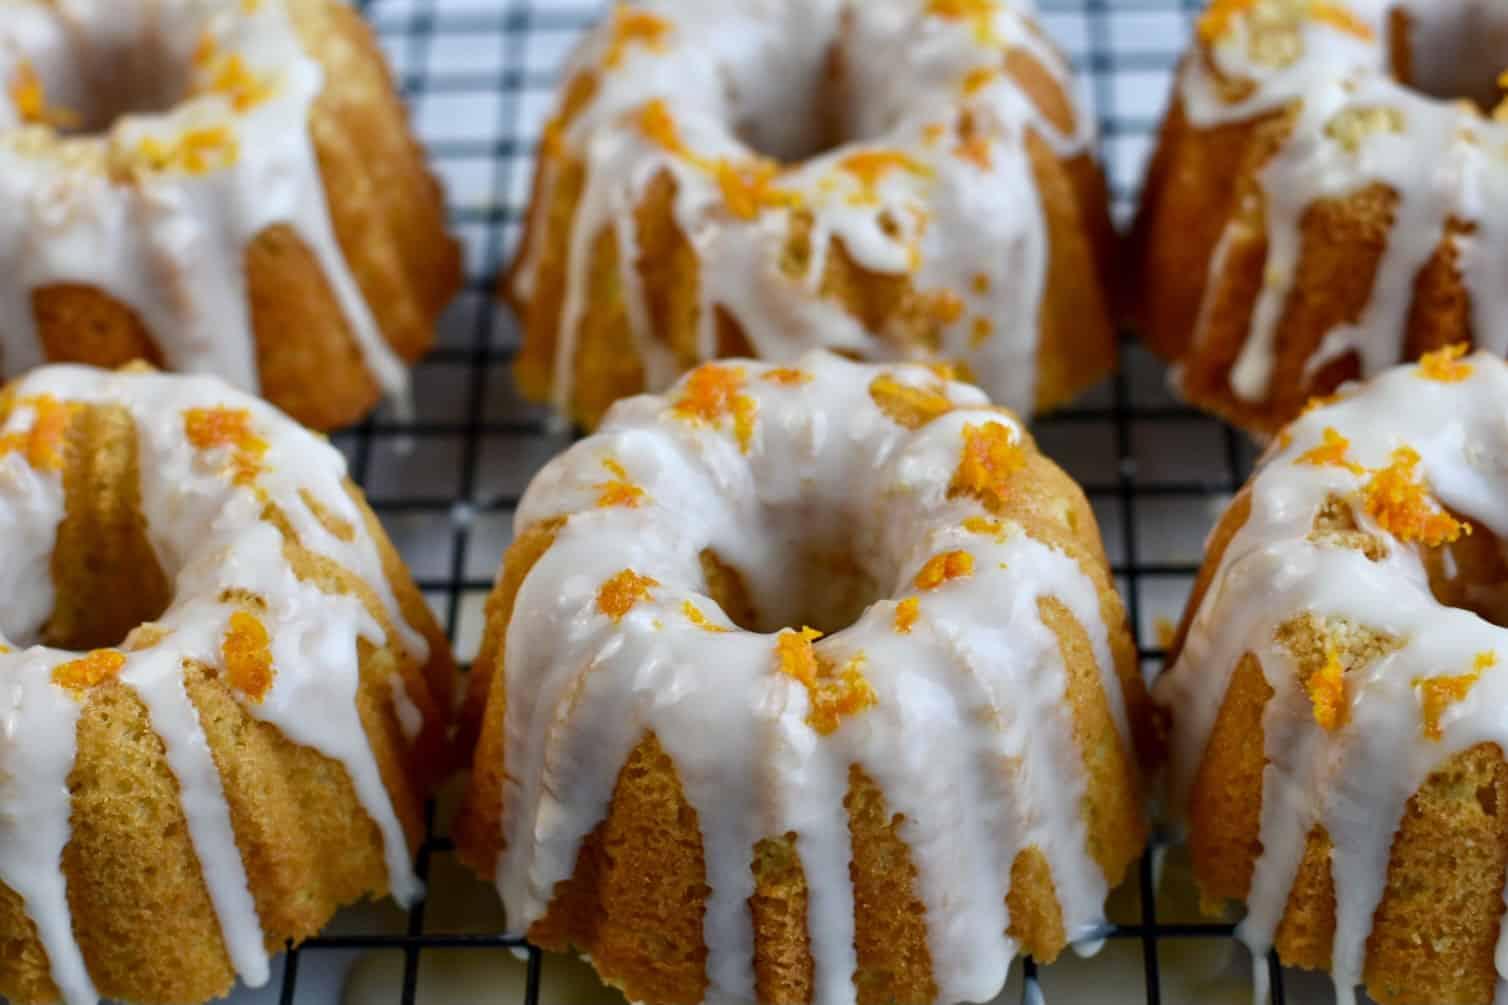 mini bundt cakes on cooling rack with glaze and orange zest